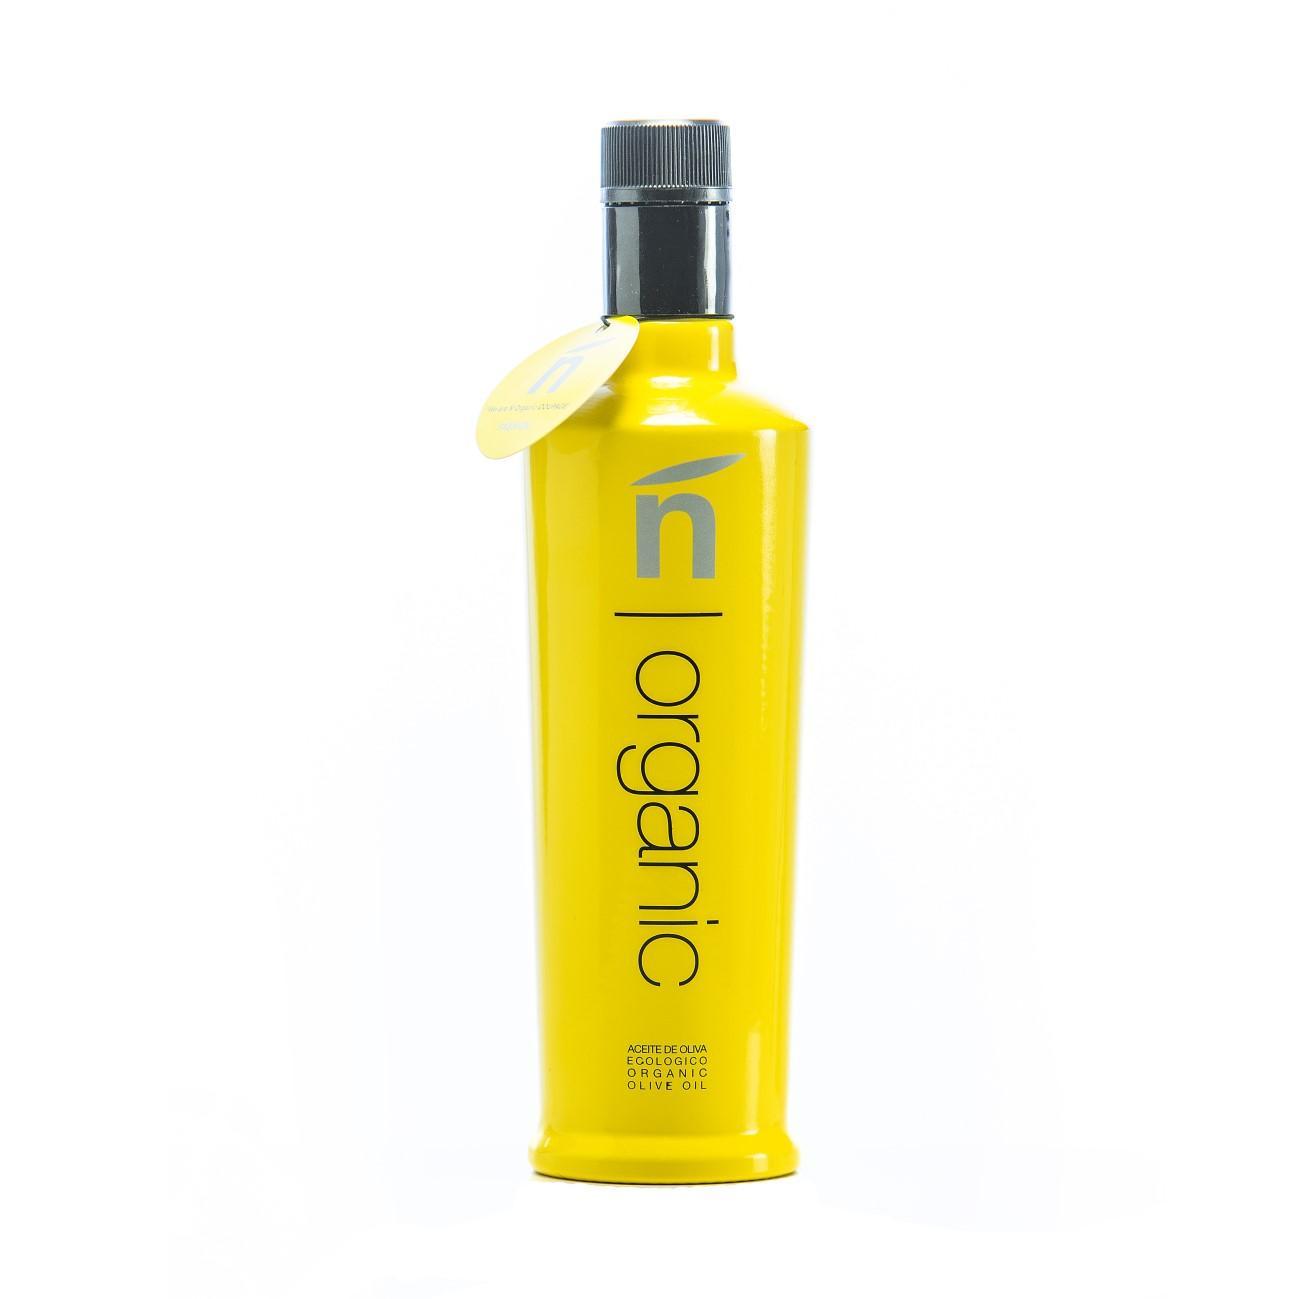 Aceite de Oliva Virgen Extra Ñ Organic